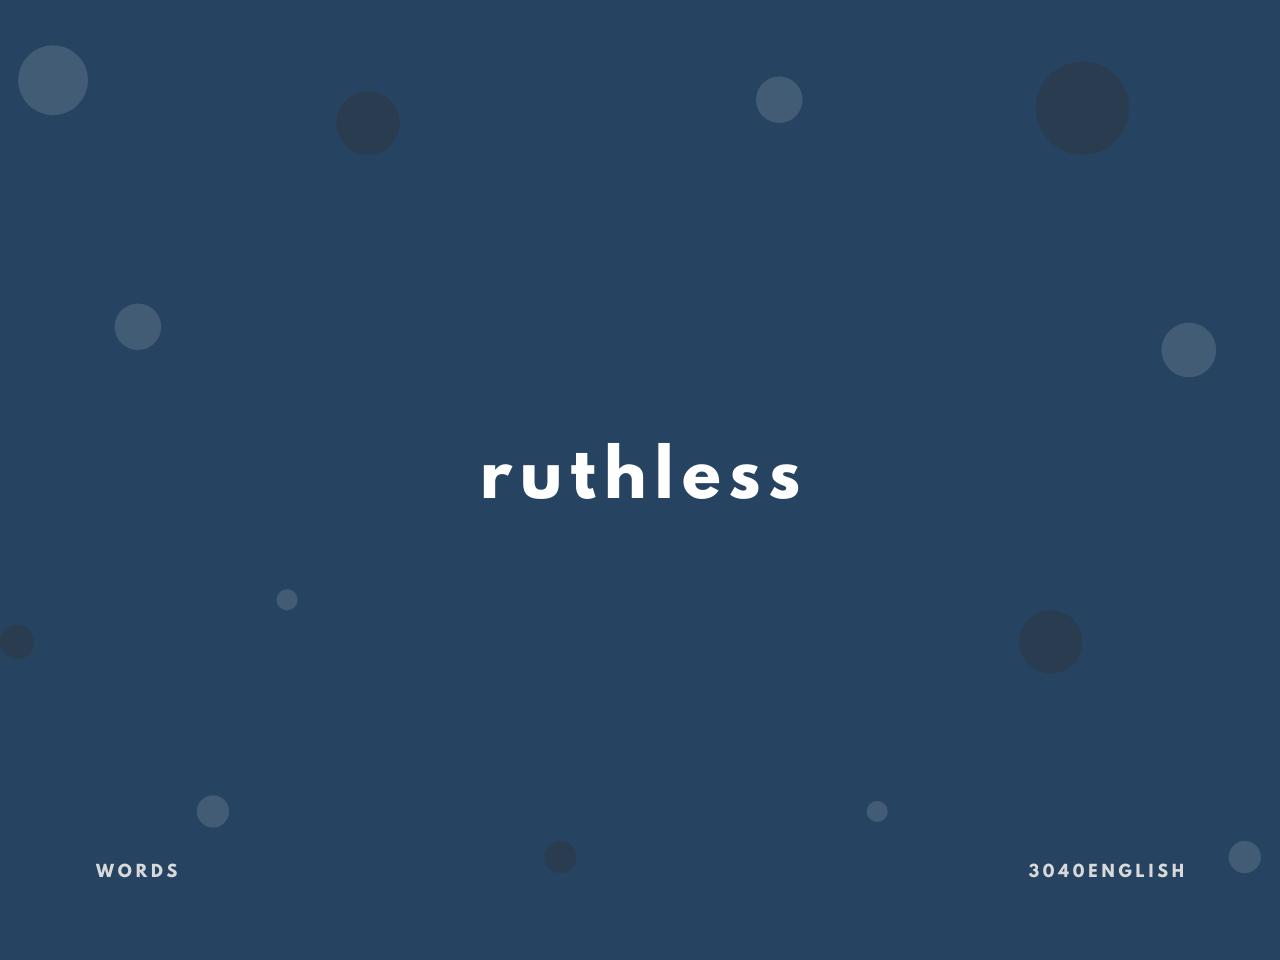 ruthless の意味と簡単な使い方【音読用例文あり】